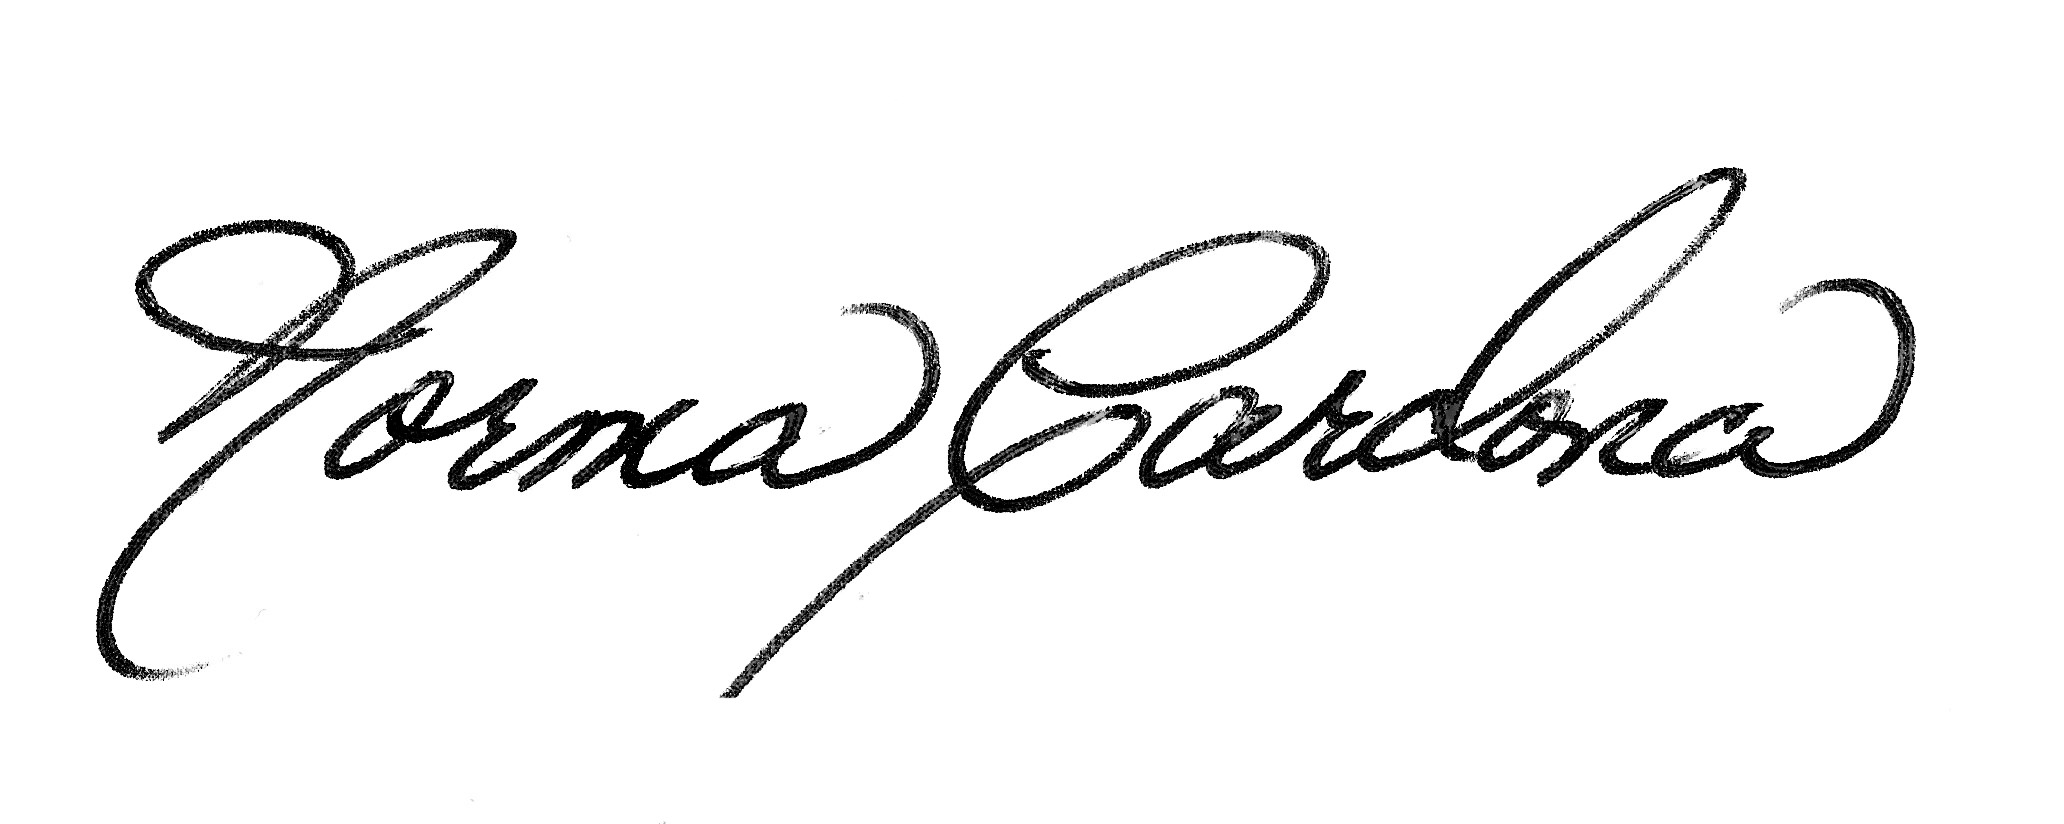 Norma Cardona Signature